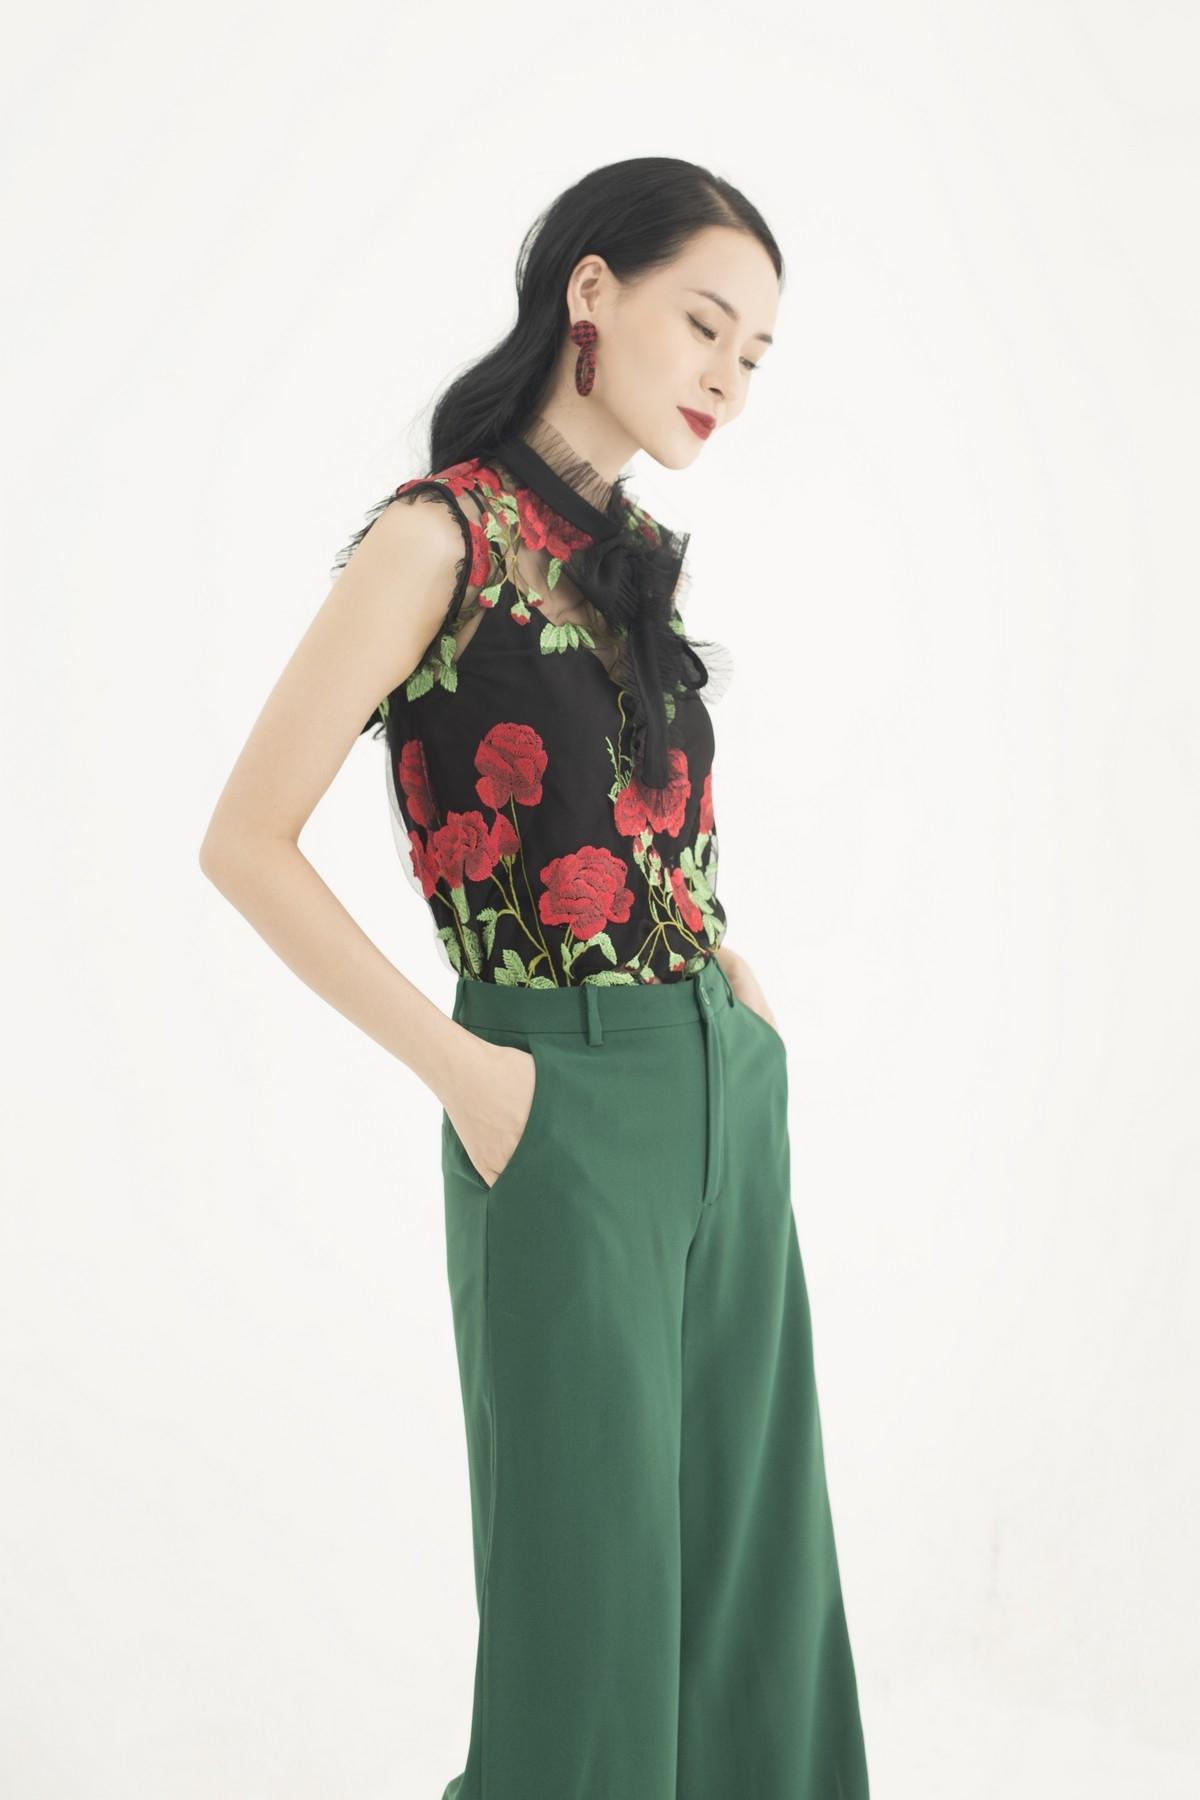 Áo kiểu nữ ren HeraDG SAK18075 màu đen hoa đỏ